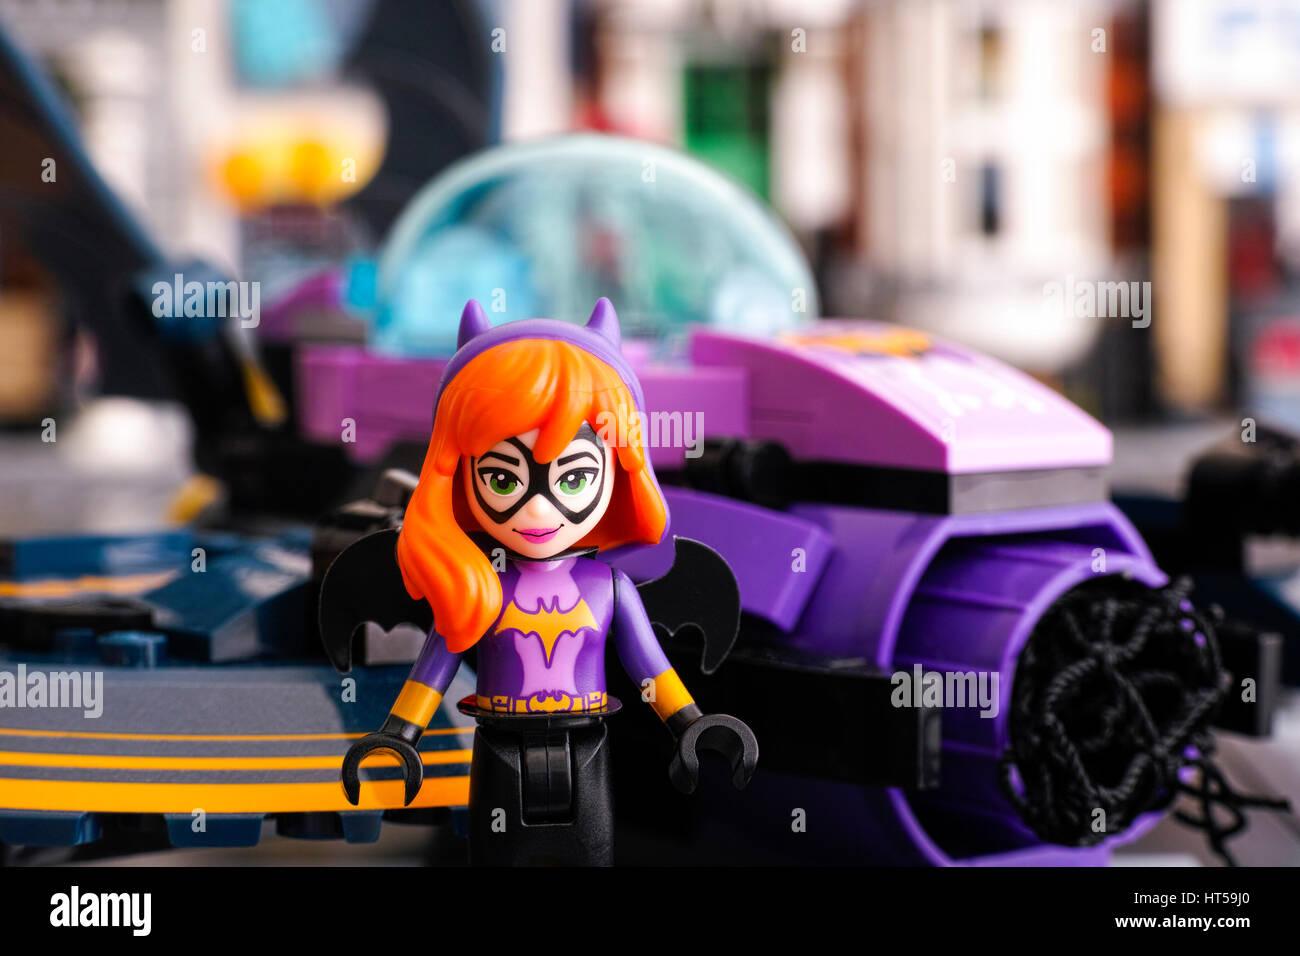 Tambov, Russian Federation - March 04, 2017 Lego DC Super Hero Girls world. Batgirl mini-doll figure against the - Stock Image